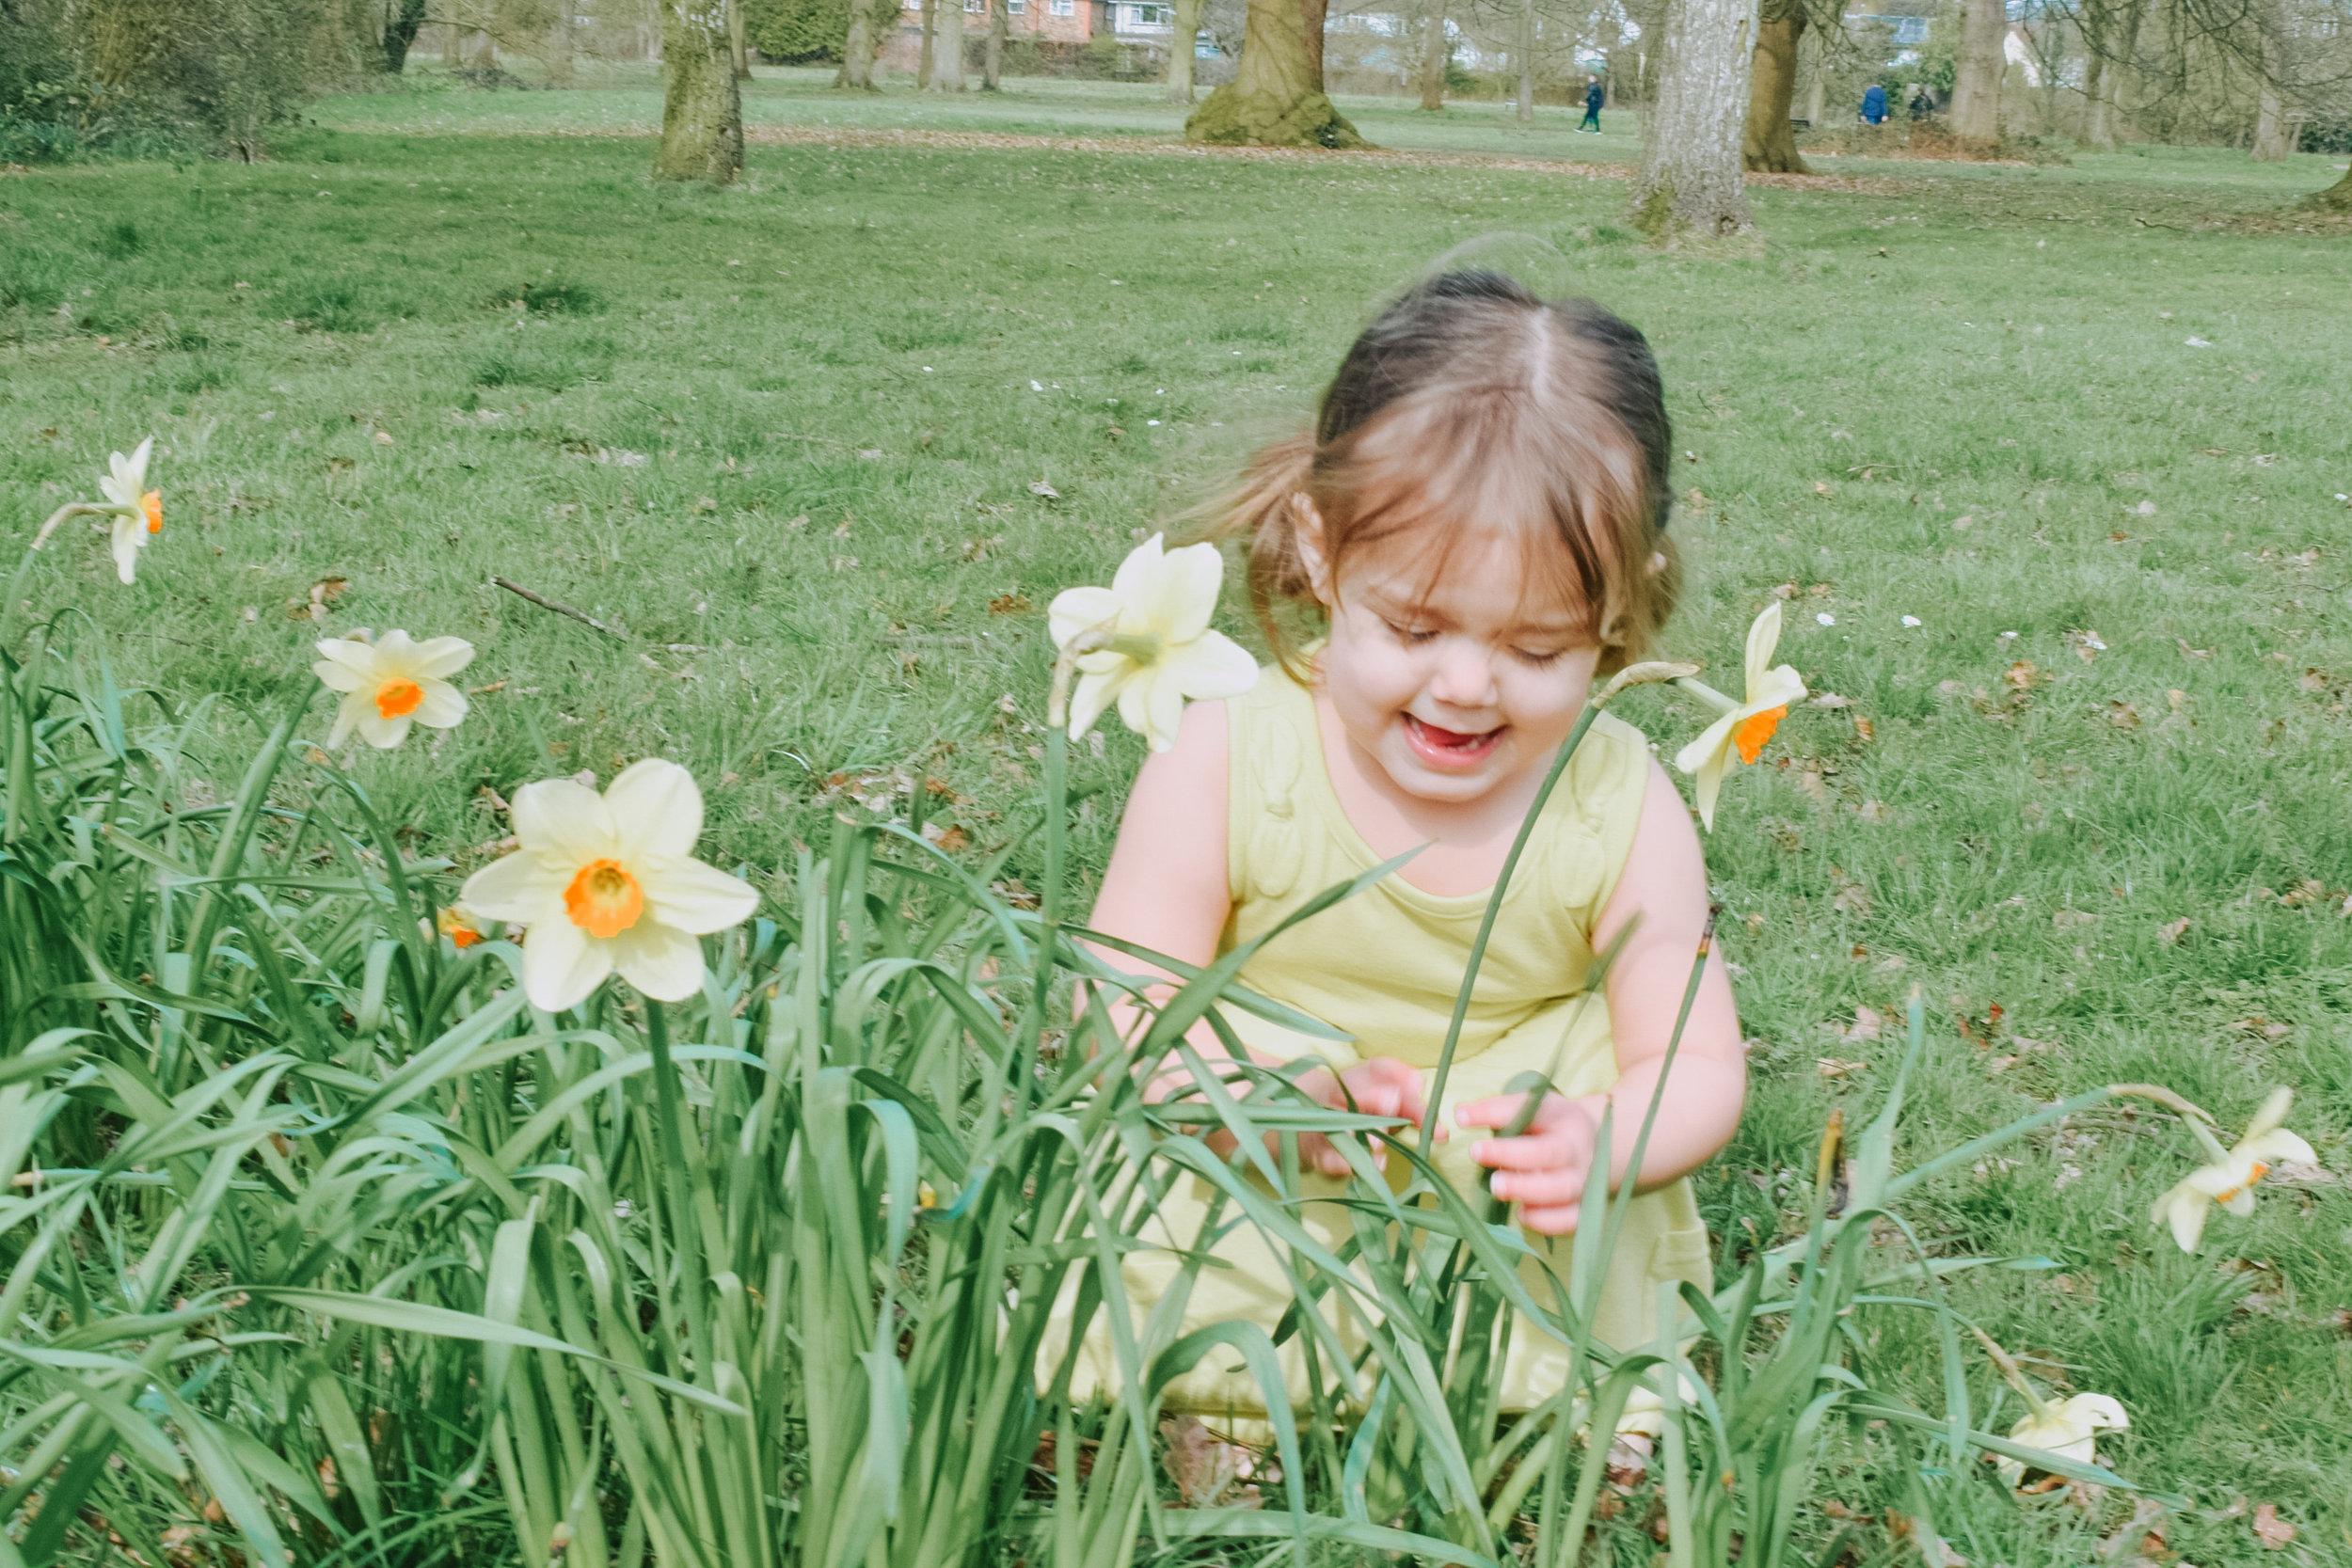 Daffodils at Cassiobury Park, Watford